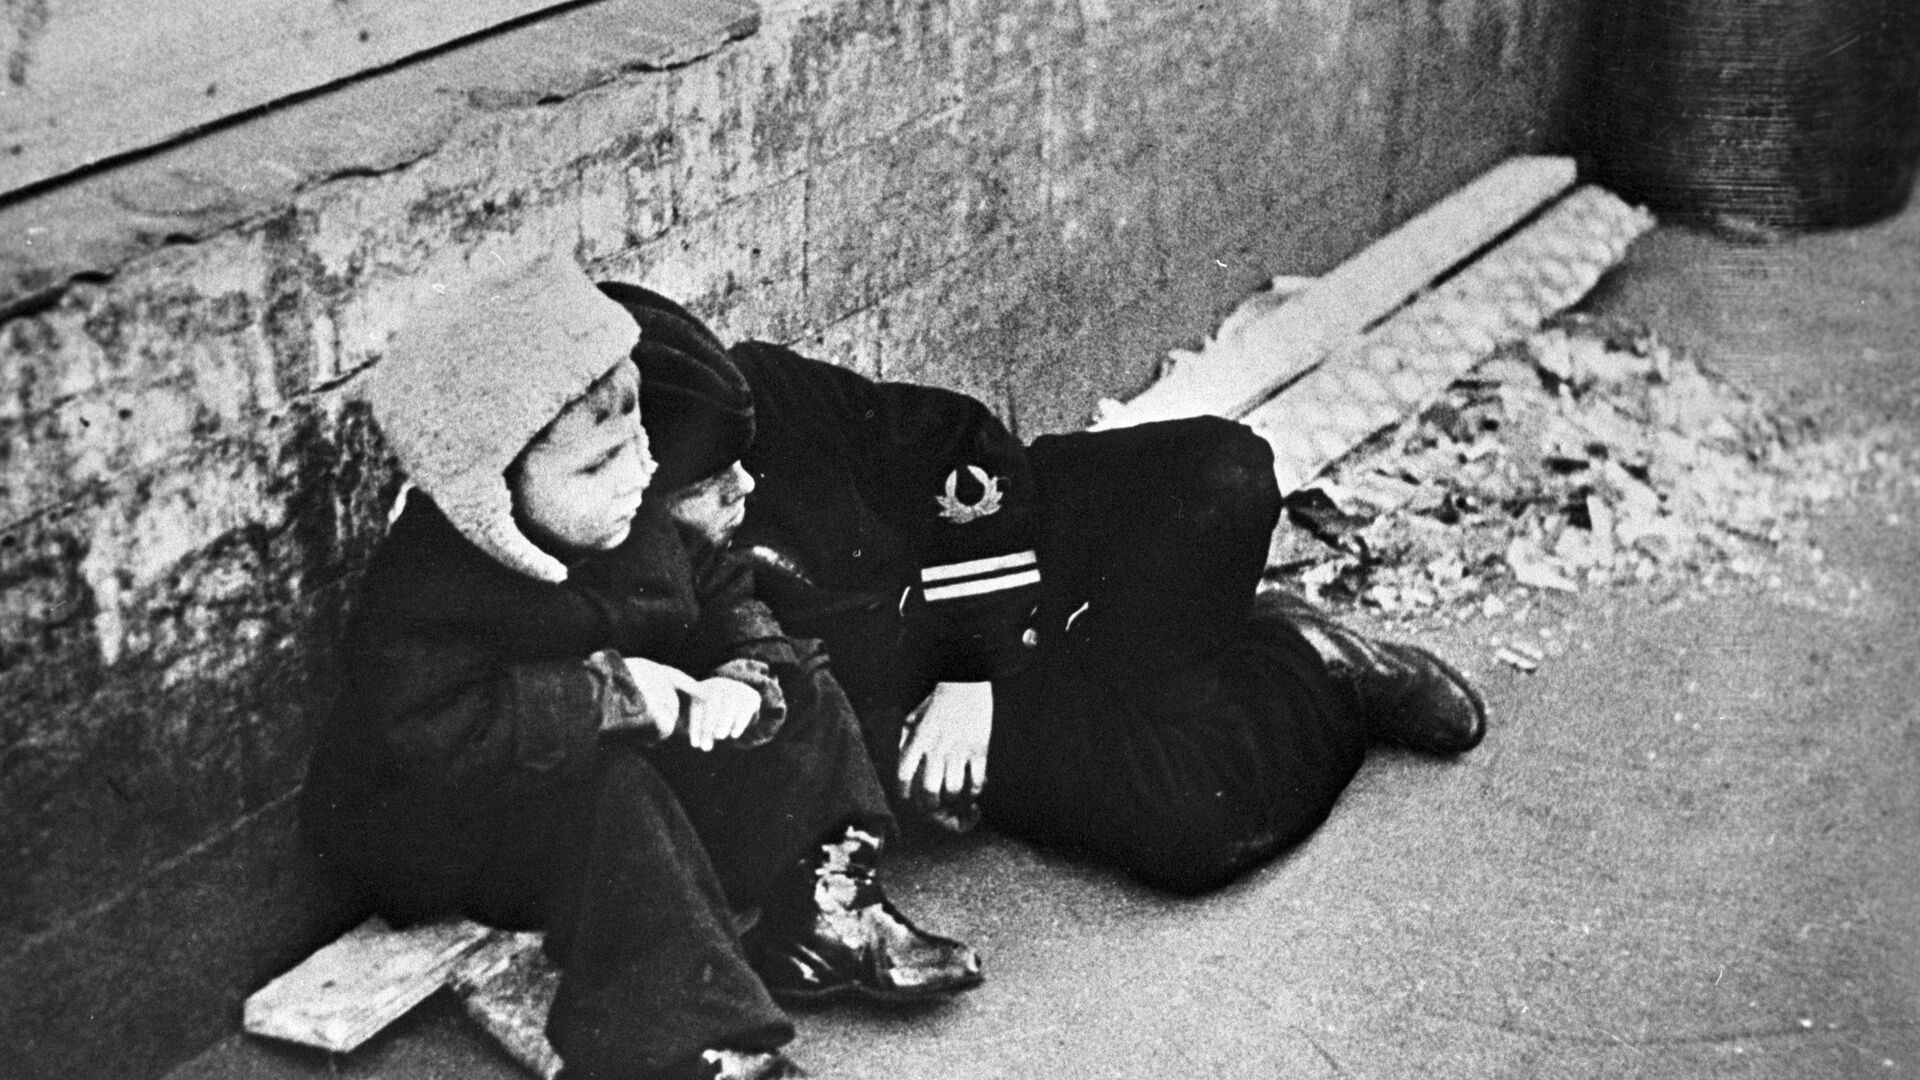 Kinder im belagerten Leningrad am 30. September 1942 - SNA, 1920, 11.10.2021